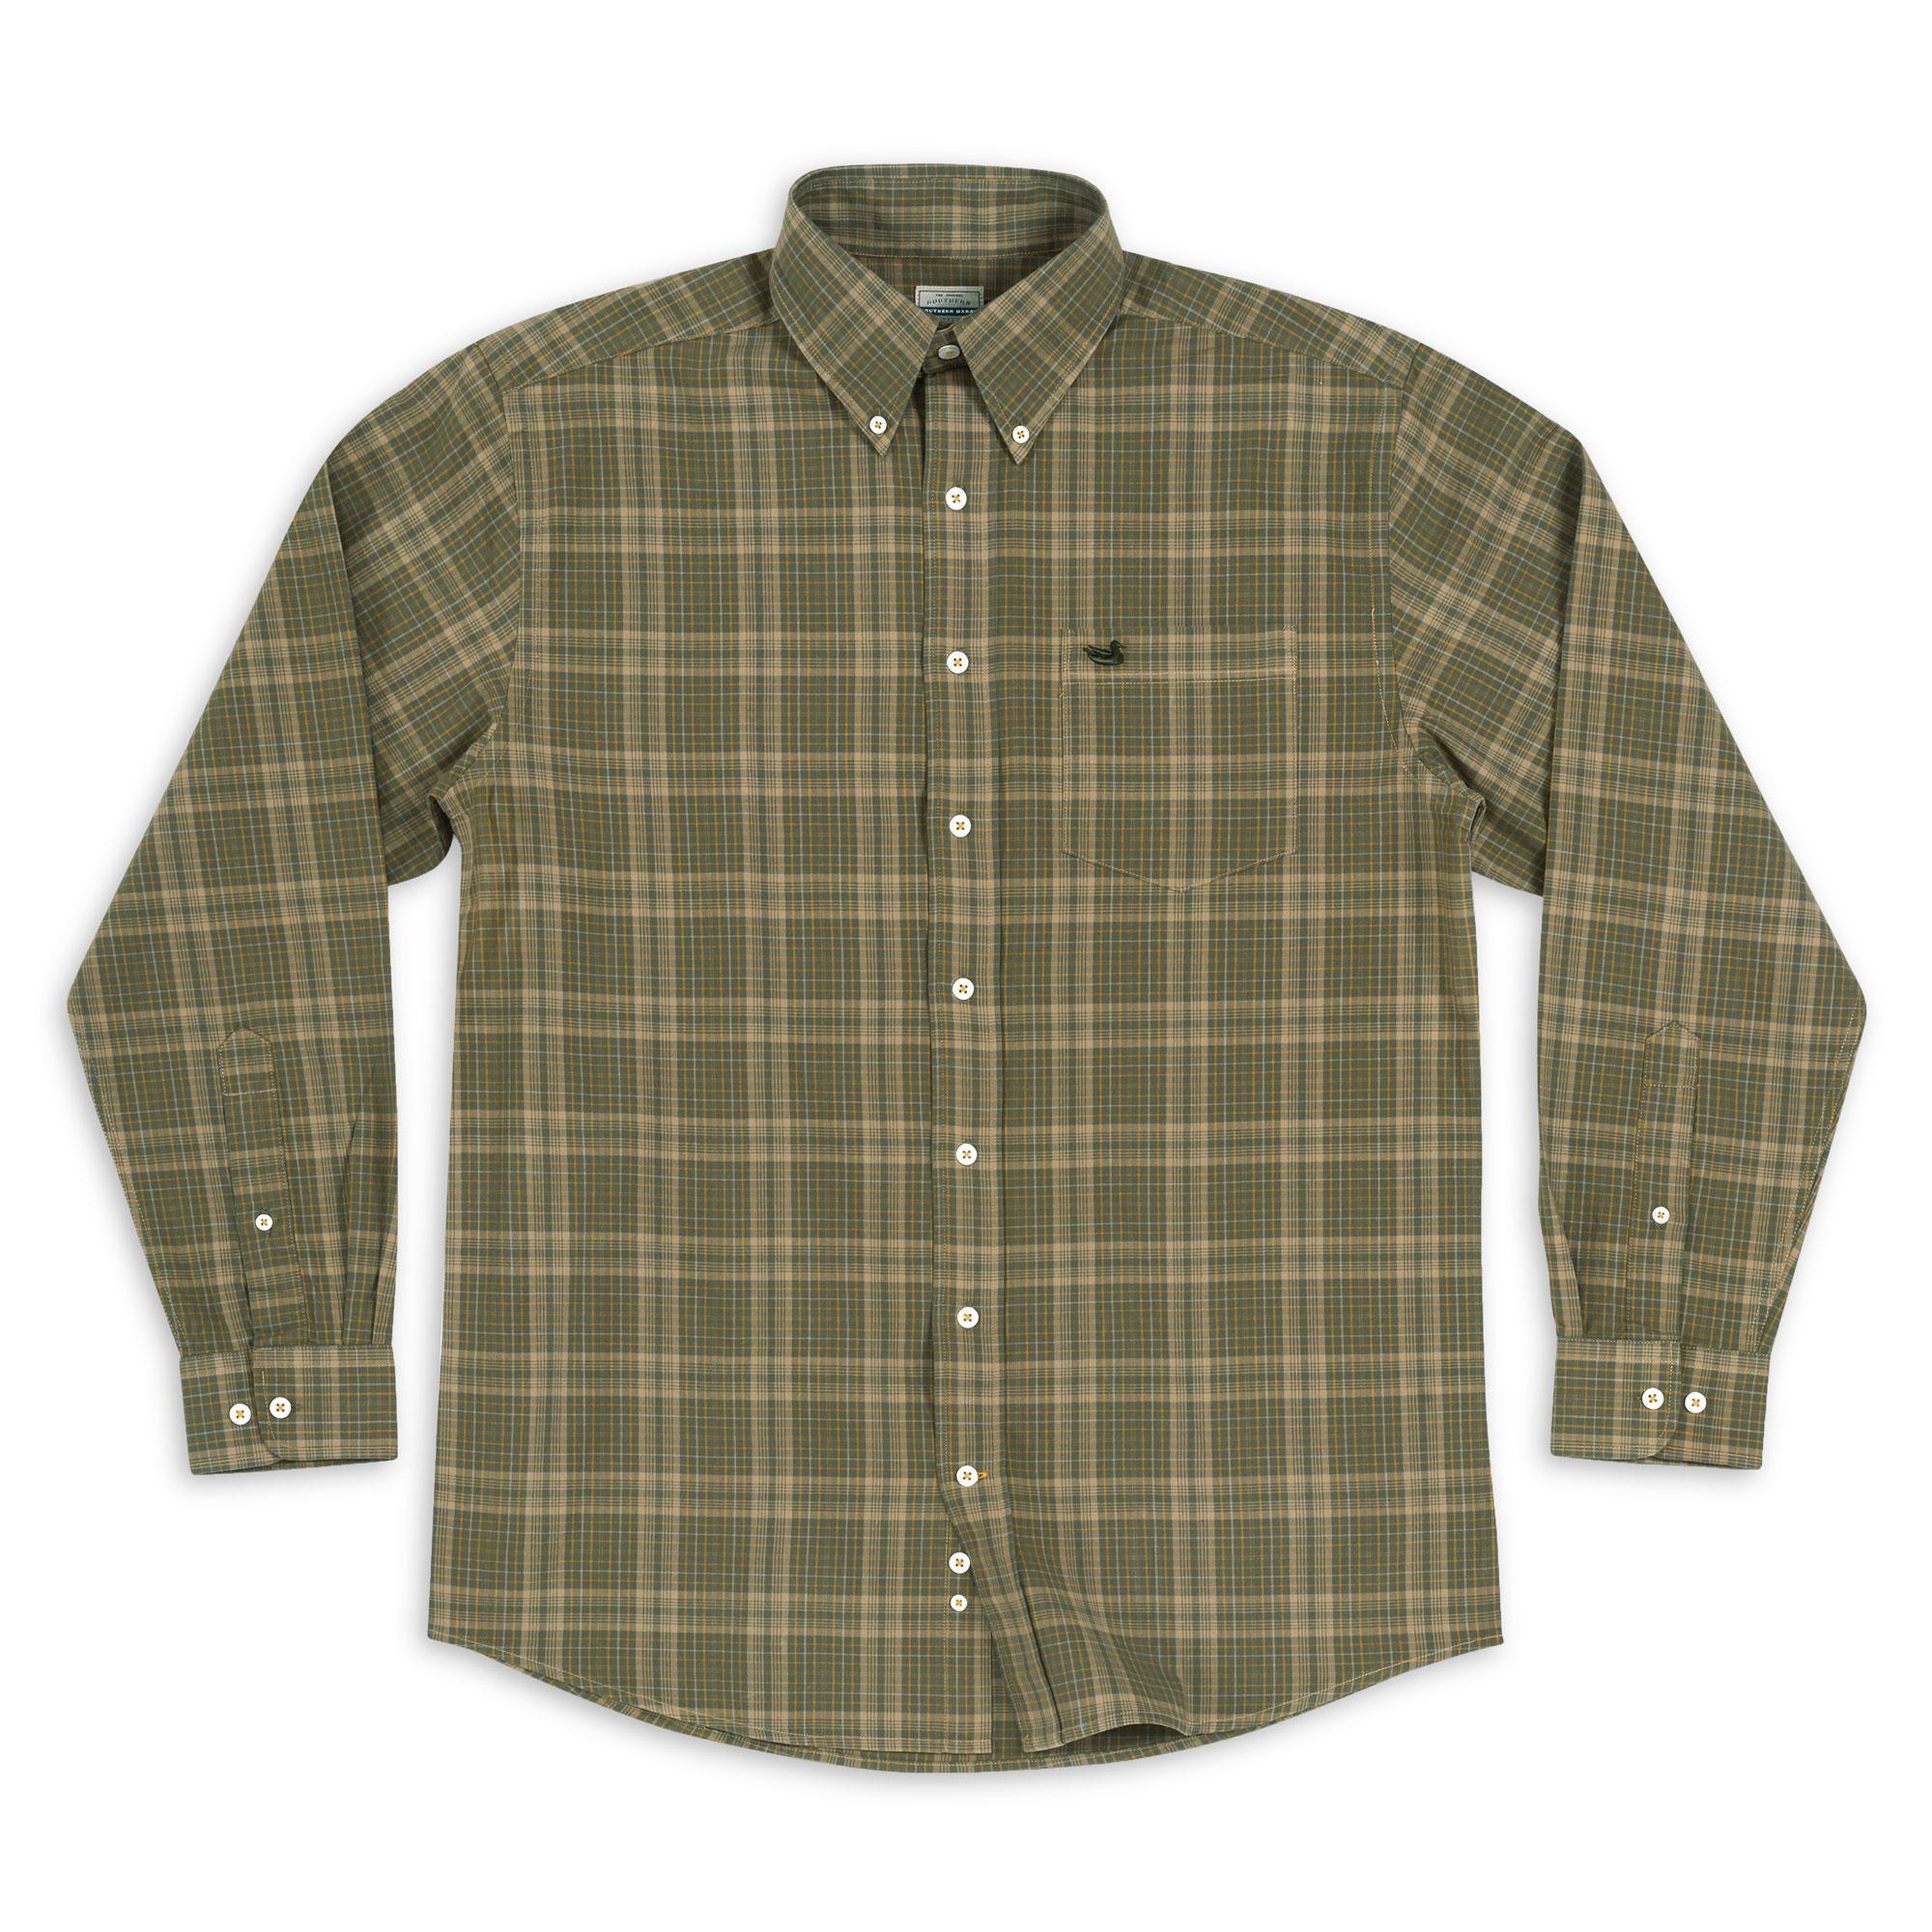 Southern Marsh Verret Washed Check Dress Shirt